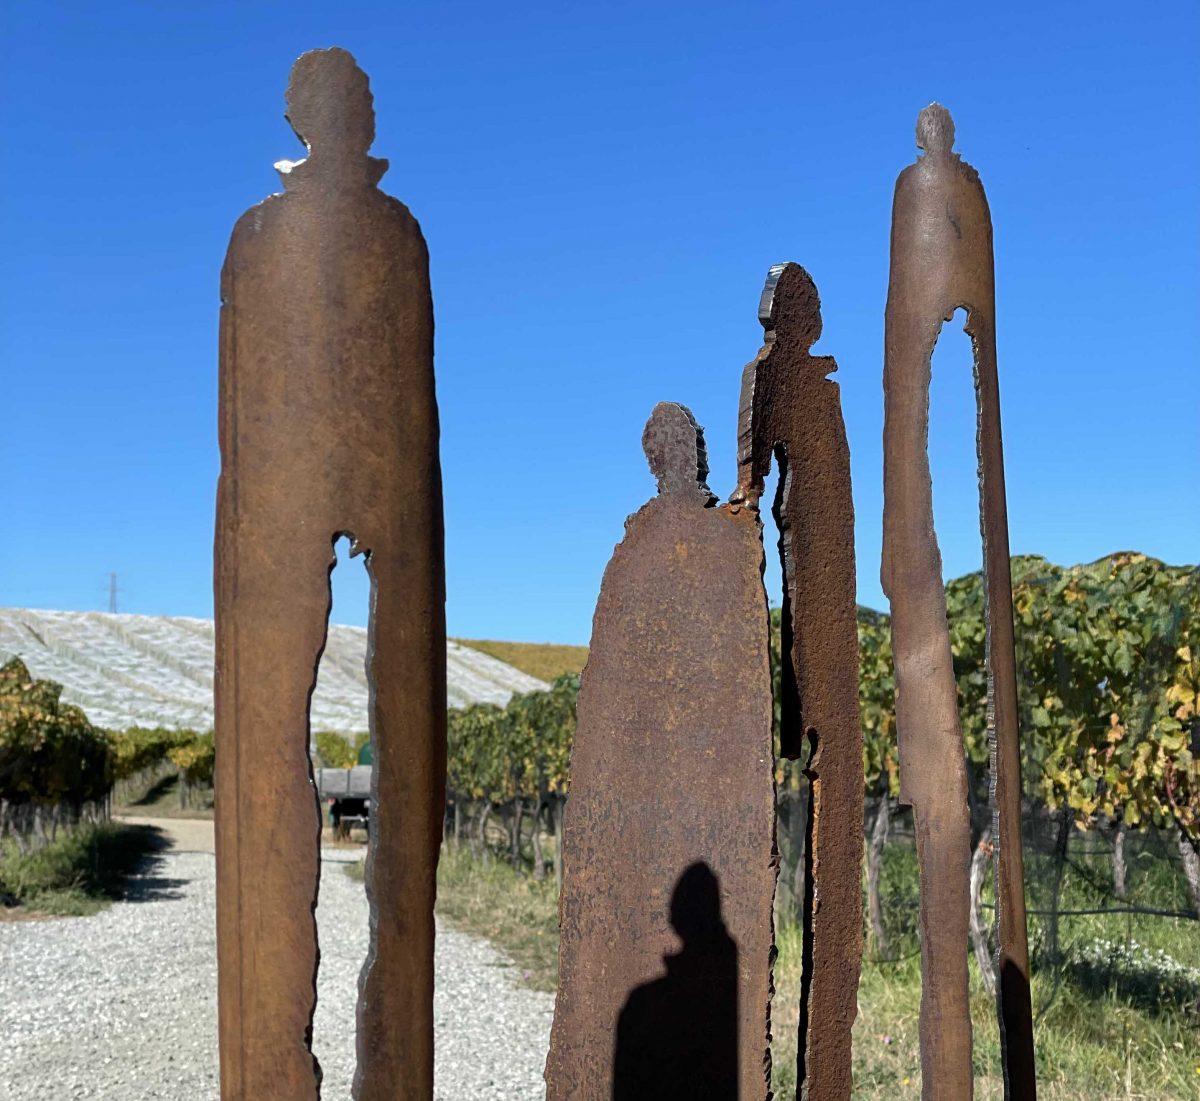 Steel sculpture by Odelle Morshuis